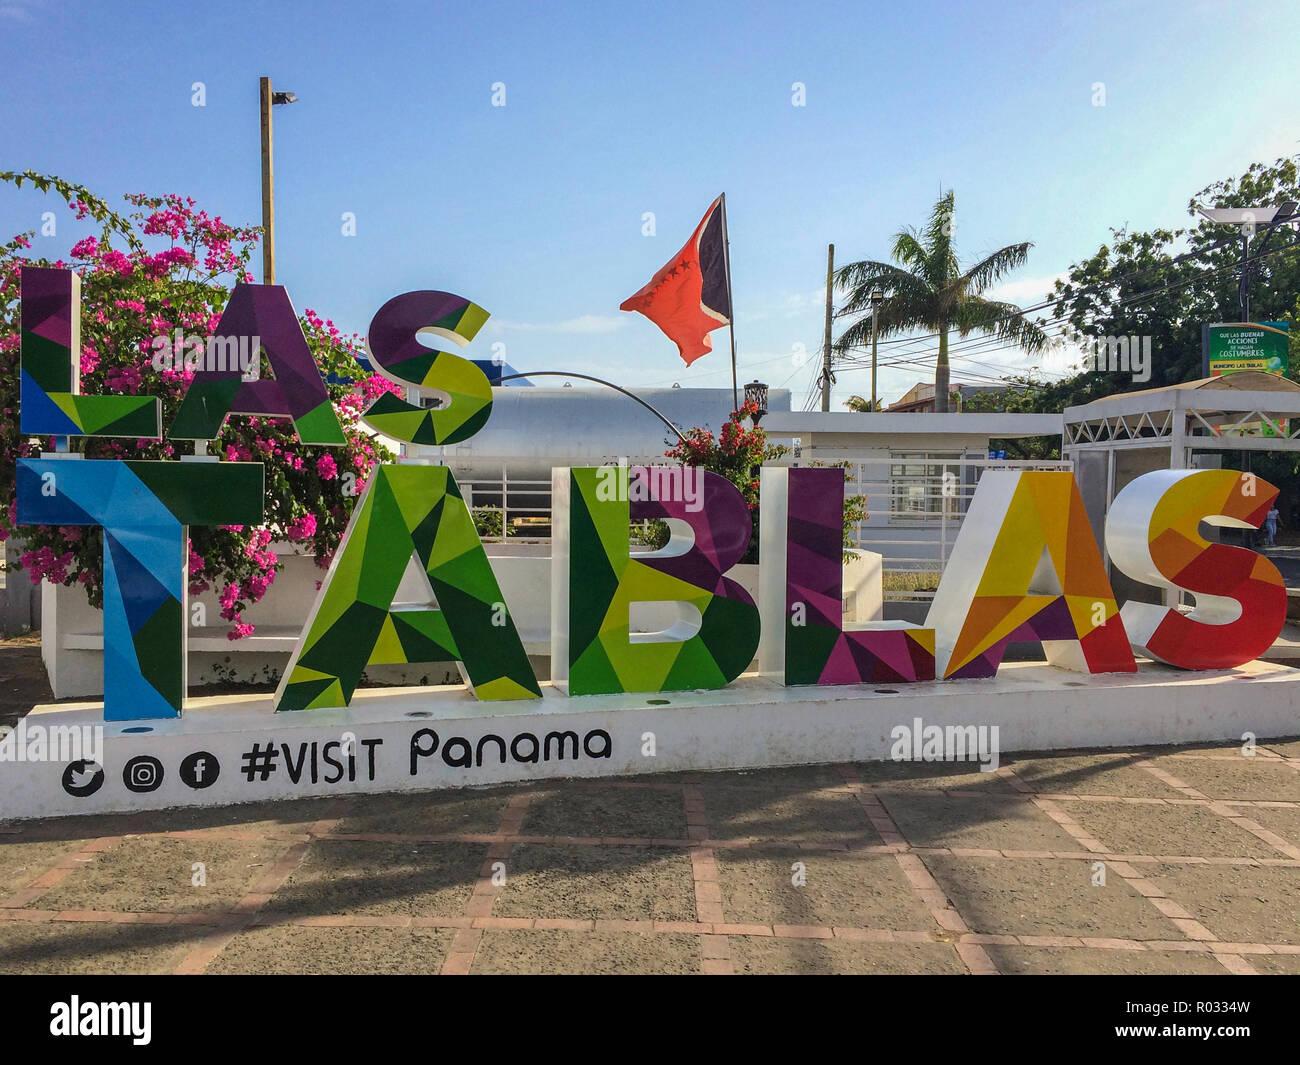 Las Tablas Panama March 2018 Famous Colorful Name Sign Of The City Las Tablas In Republic Of Panama Stock Photo Alamy